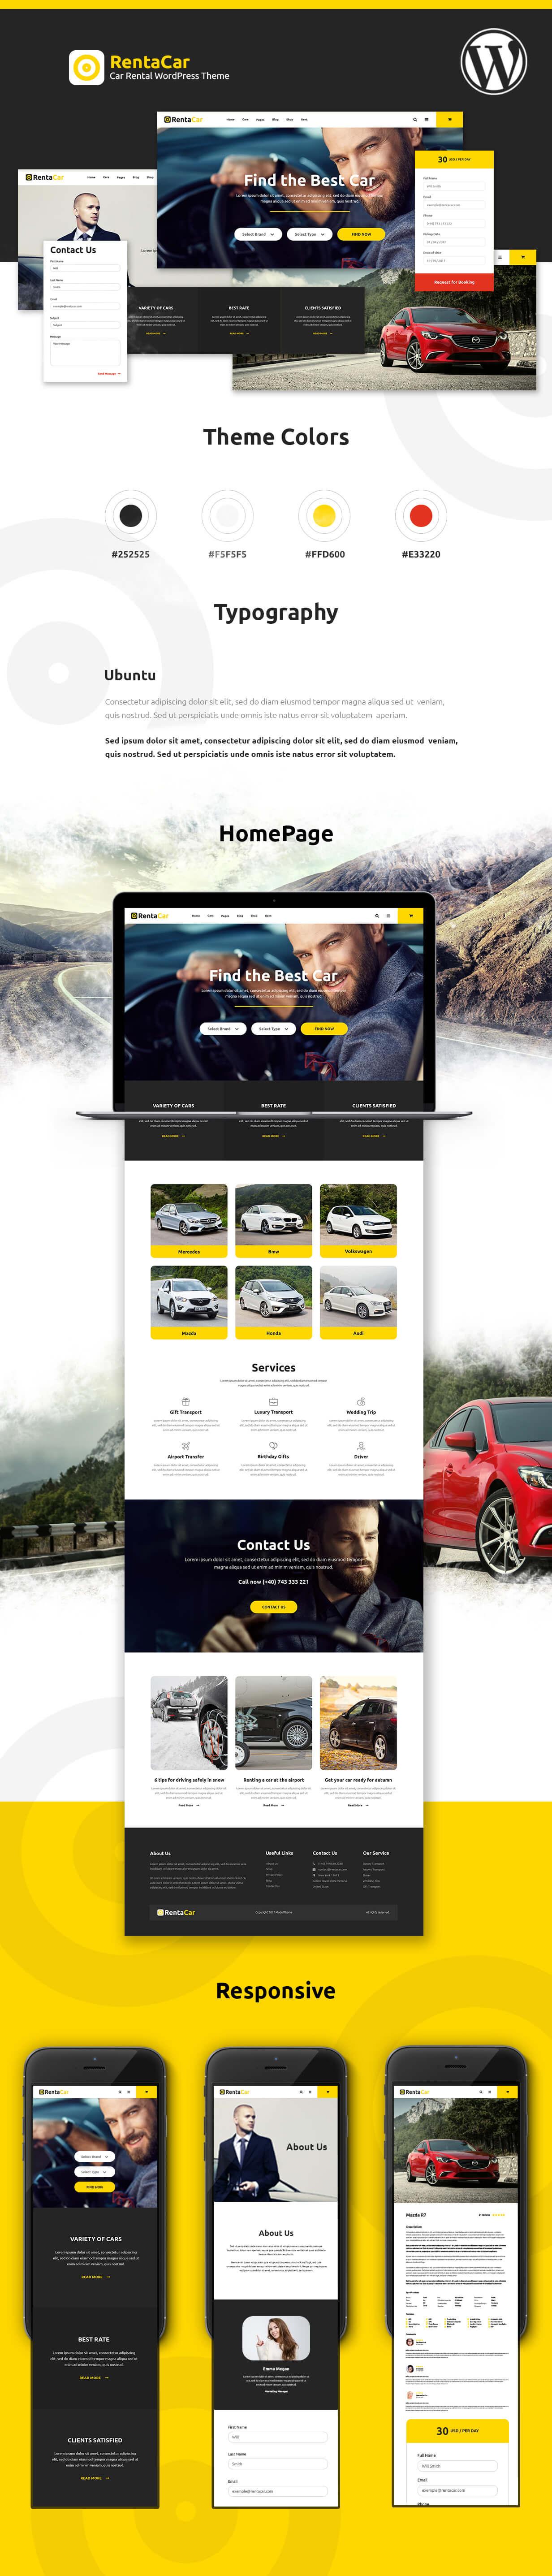 Rentacar - Car Rental / Listing WordPress Theme - 4